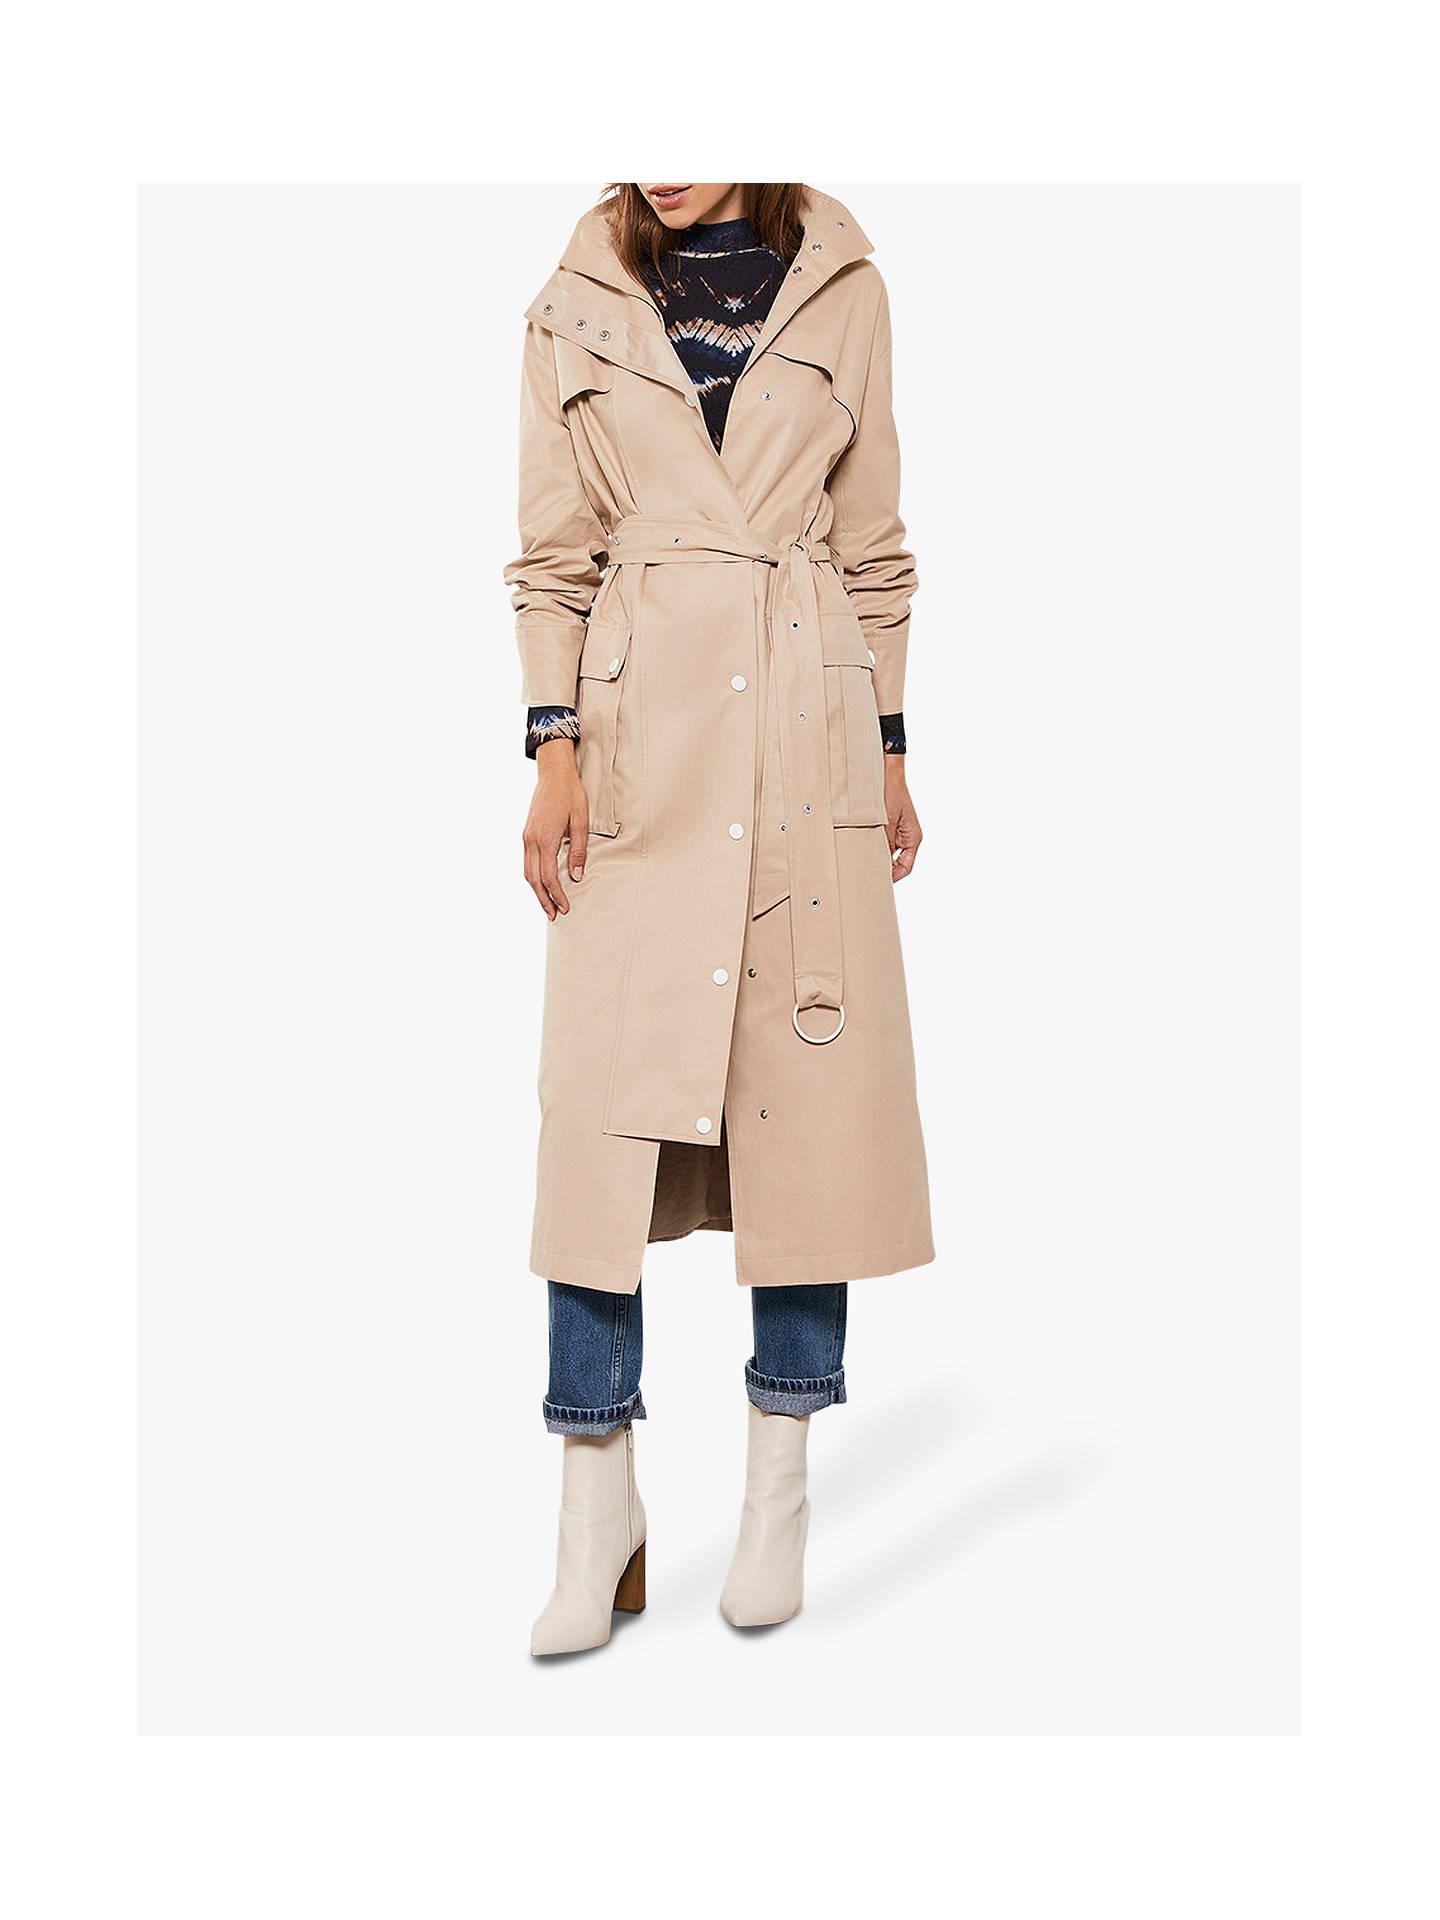 performance sportswear release date low price Mint Velvet Cotton-Blend Trench Coat, Beige